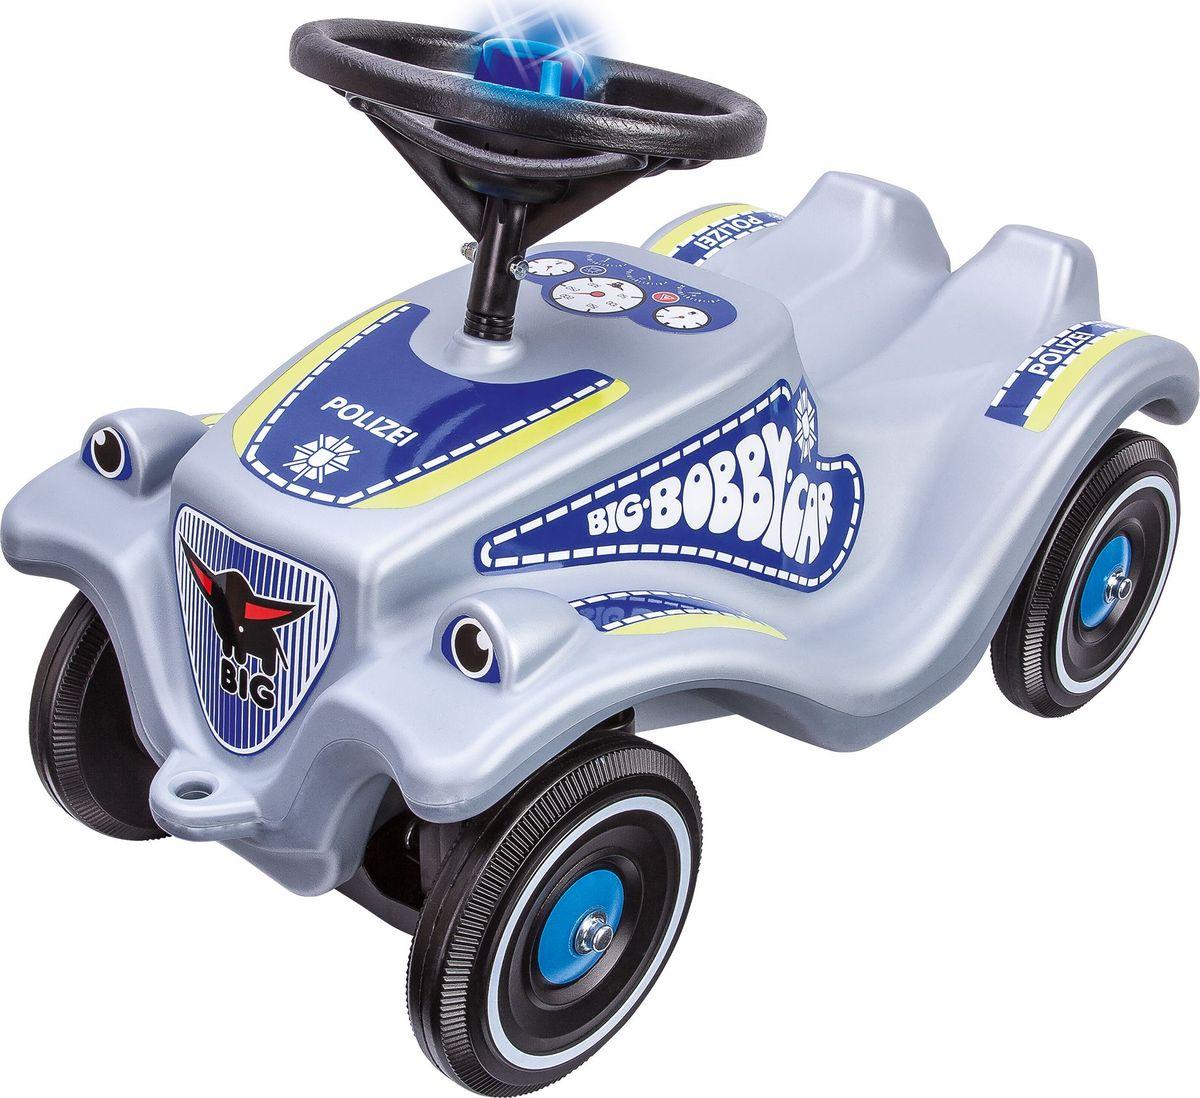 Big Машинка BC Classic Police -  Каталки, понициклы